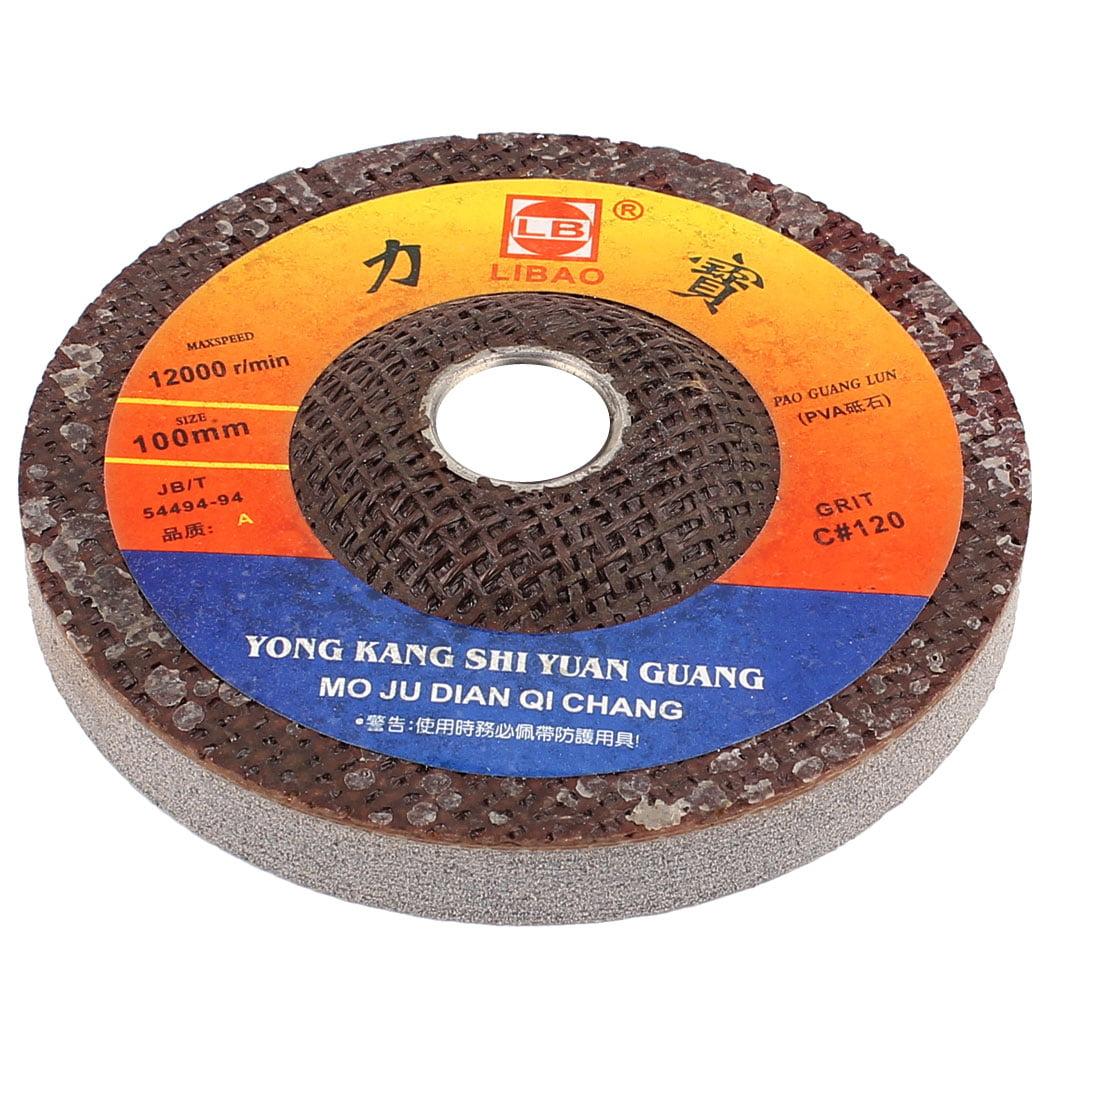 100mm x 16mm Metal Grinding Tool Abrasive Polishing Wheel Gray by